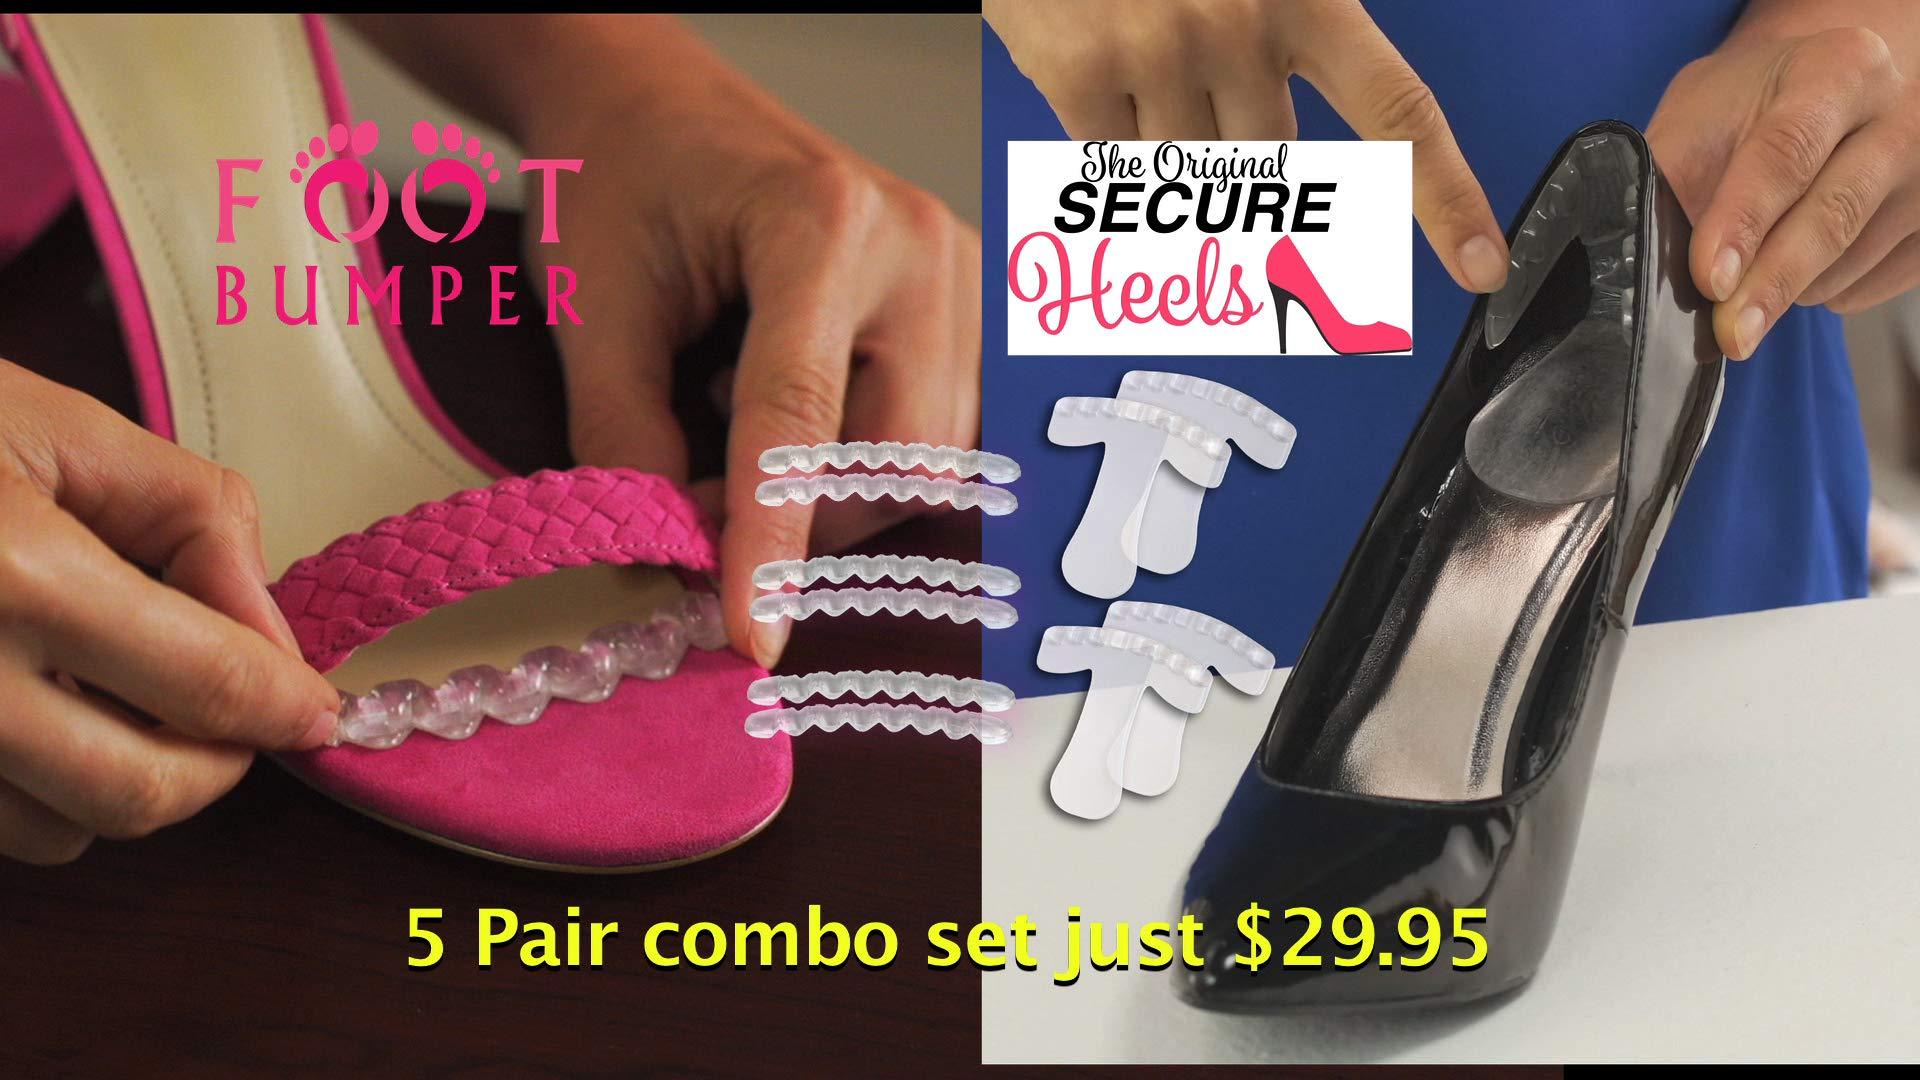 Foot Bumper & Secure Heels Comfort Solution.